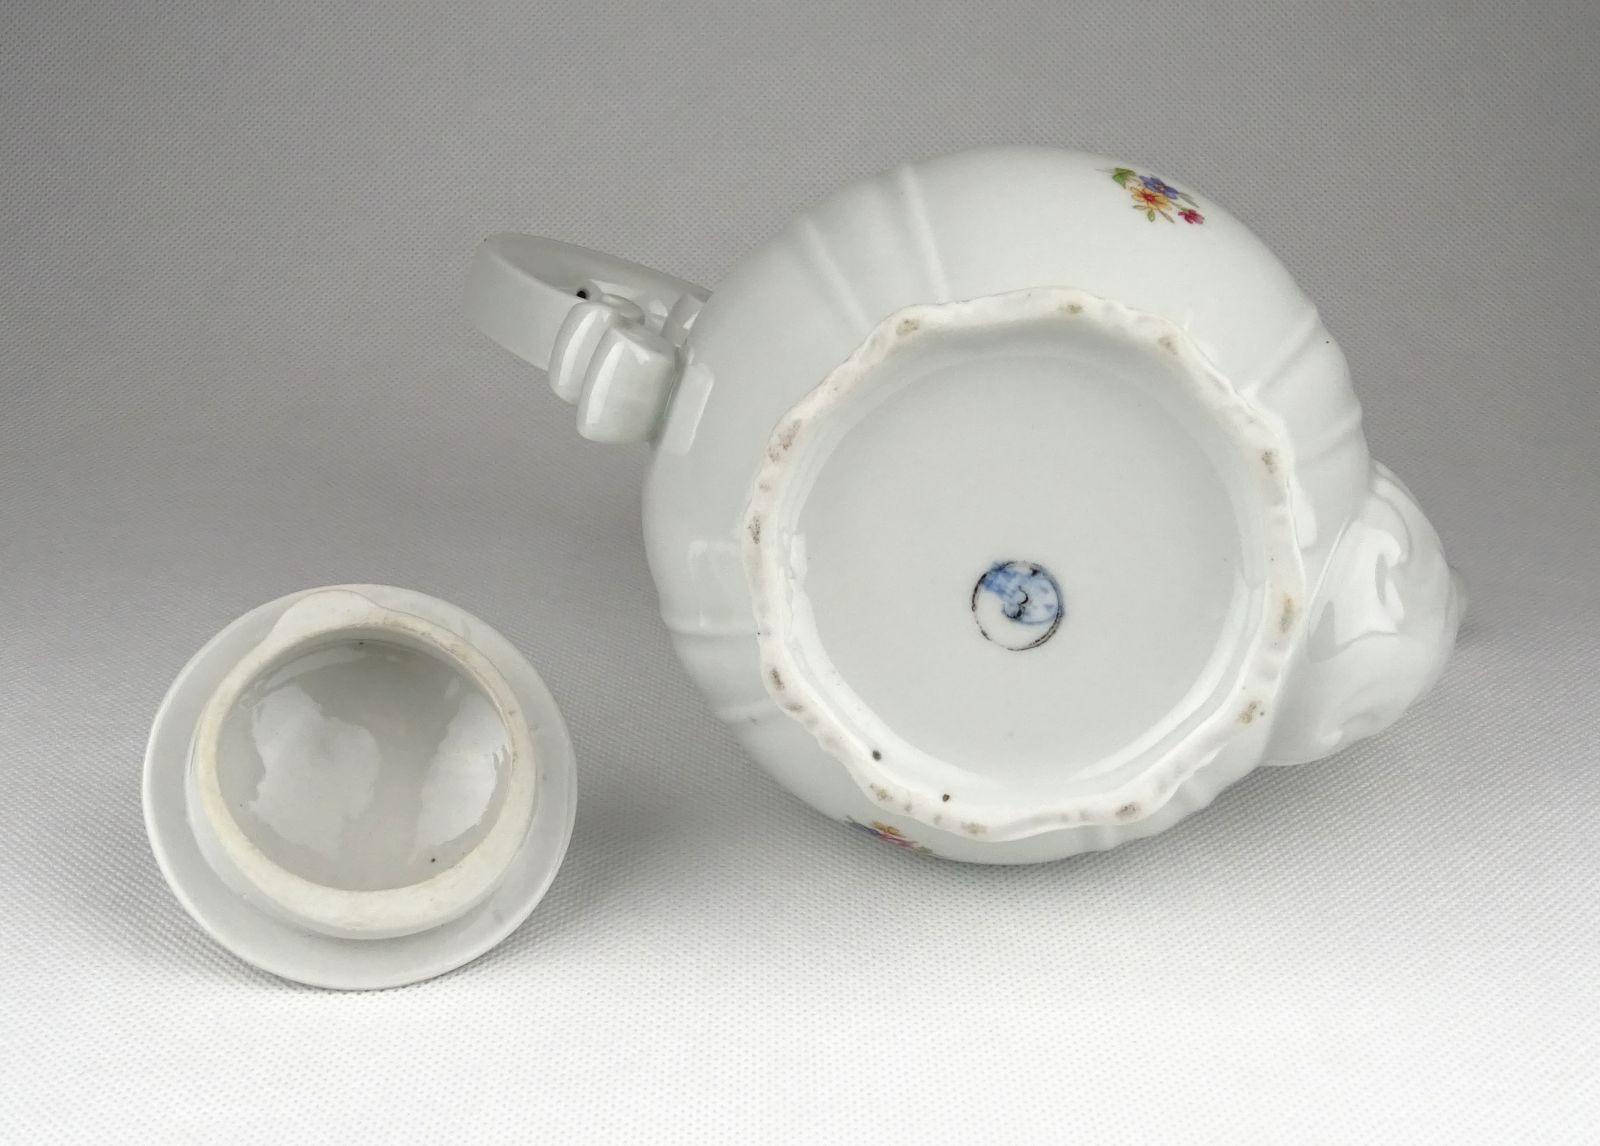 DSC05507.JPG (1600×1146)